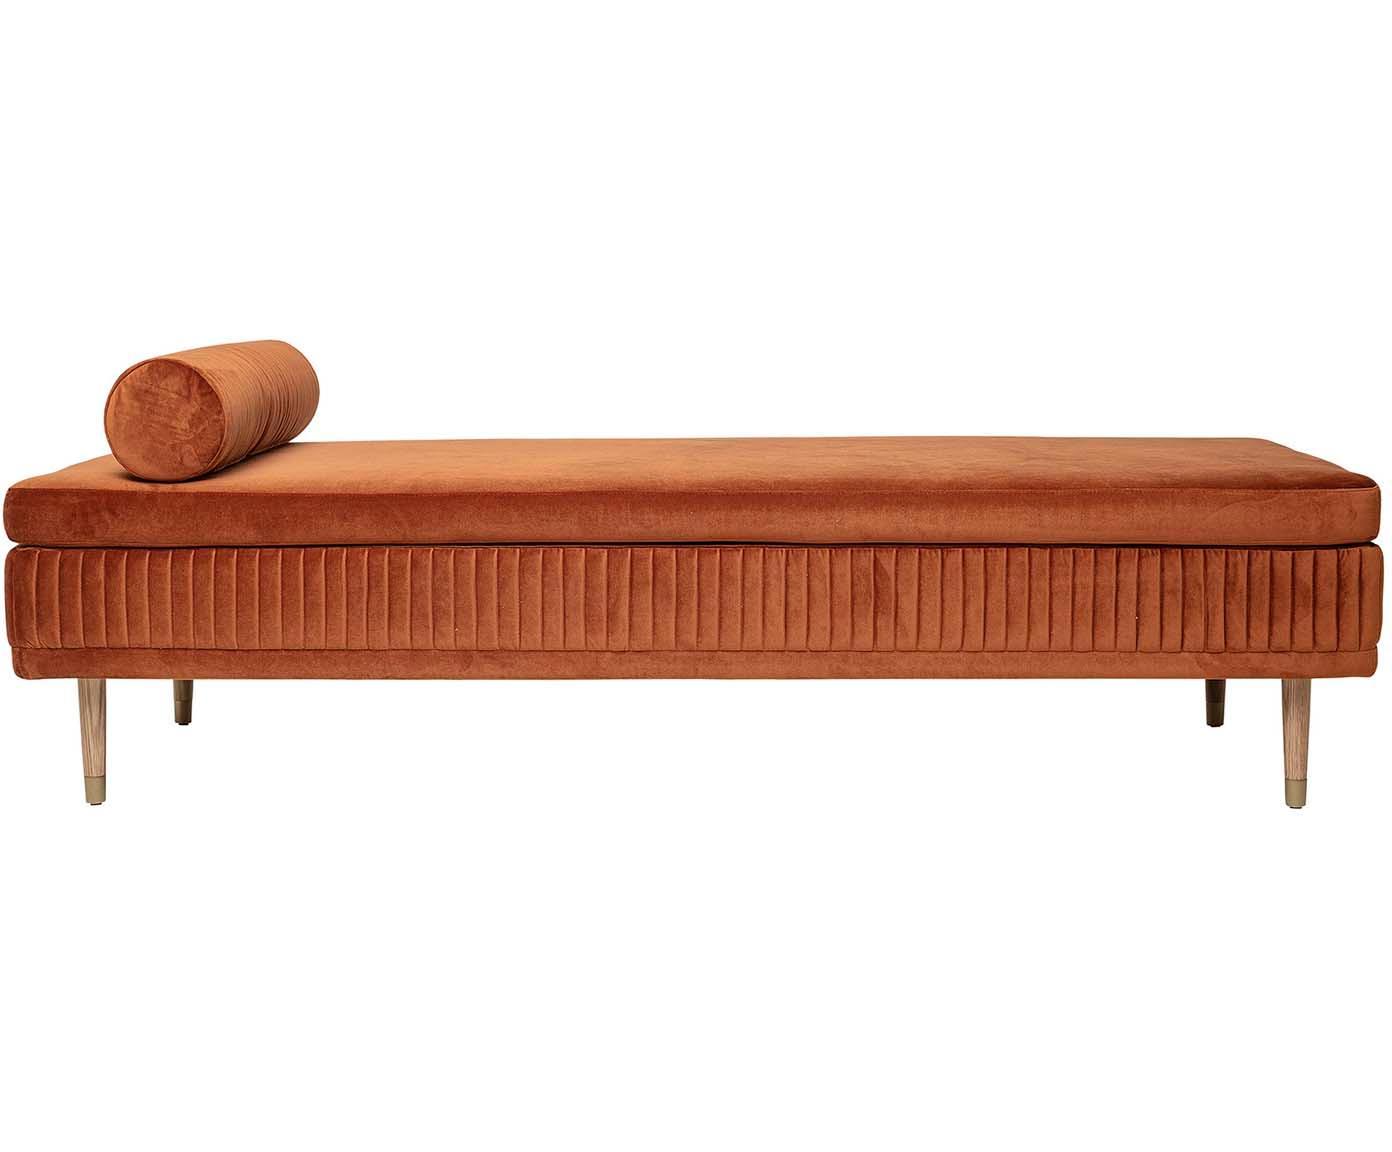 Fluwelen daybed Hailey, Bekleding: polyester fluweel, Poten: eikenhout, metaal, Fluweel roestbruin, B 190 x D 80 cm